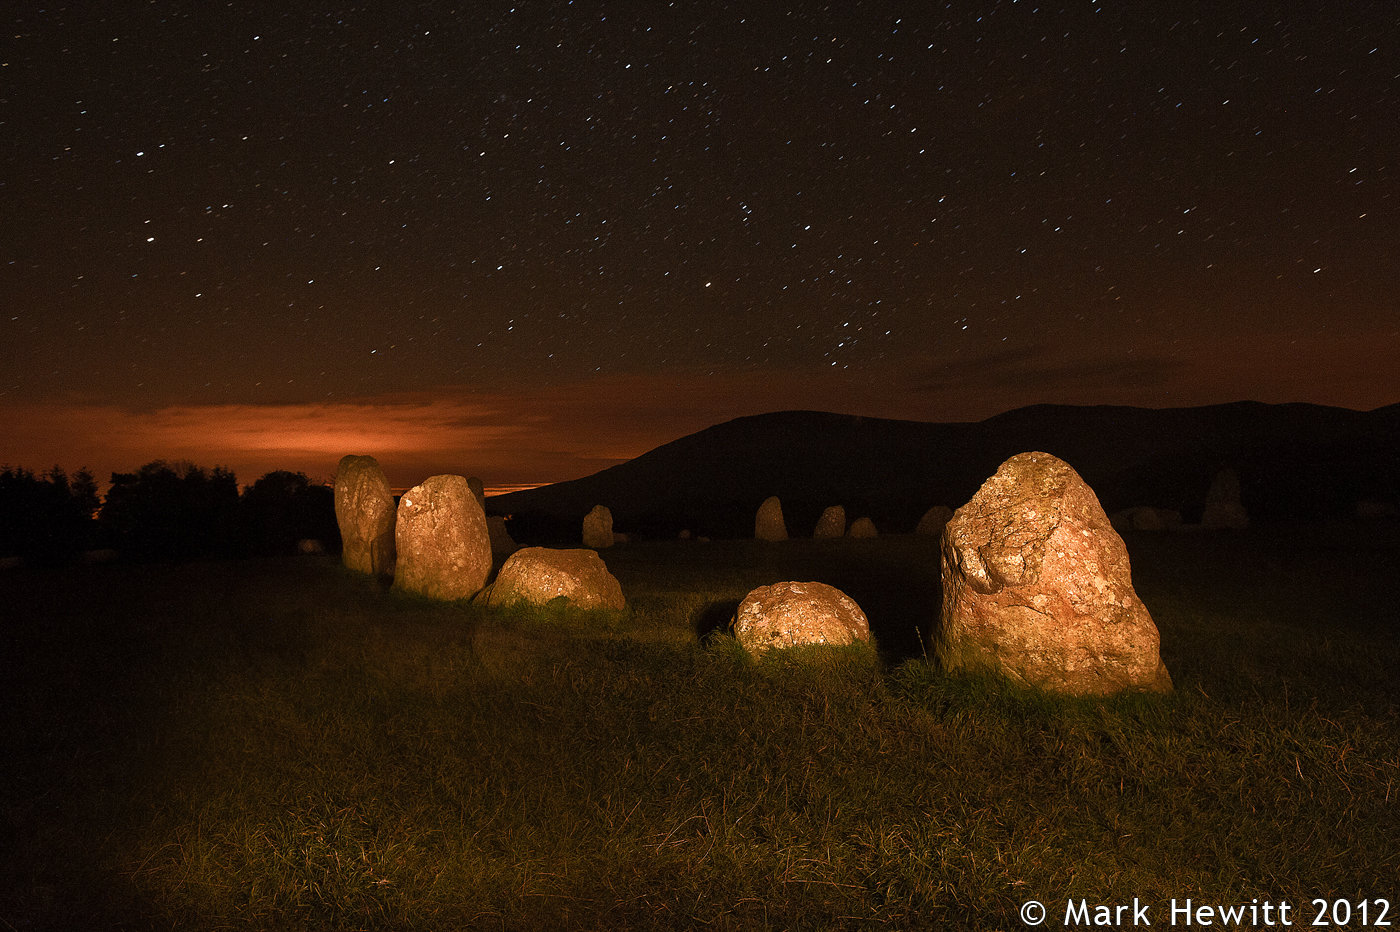 The Stones & The Stars